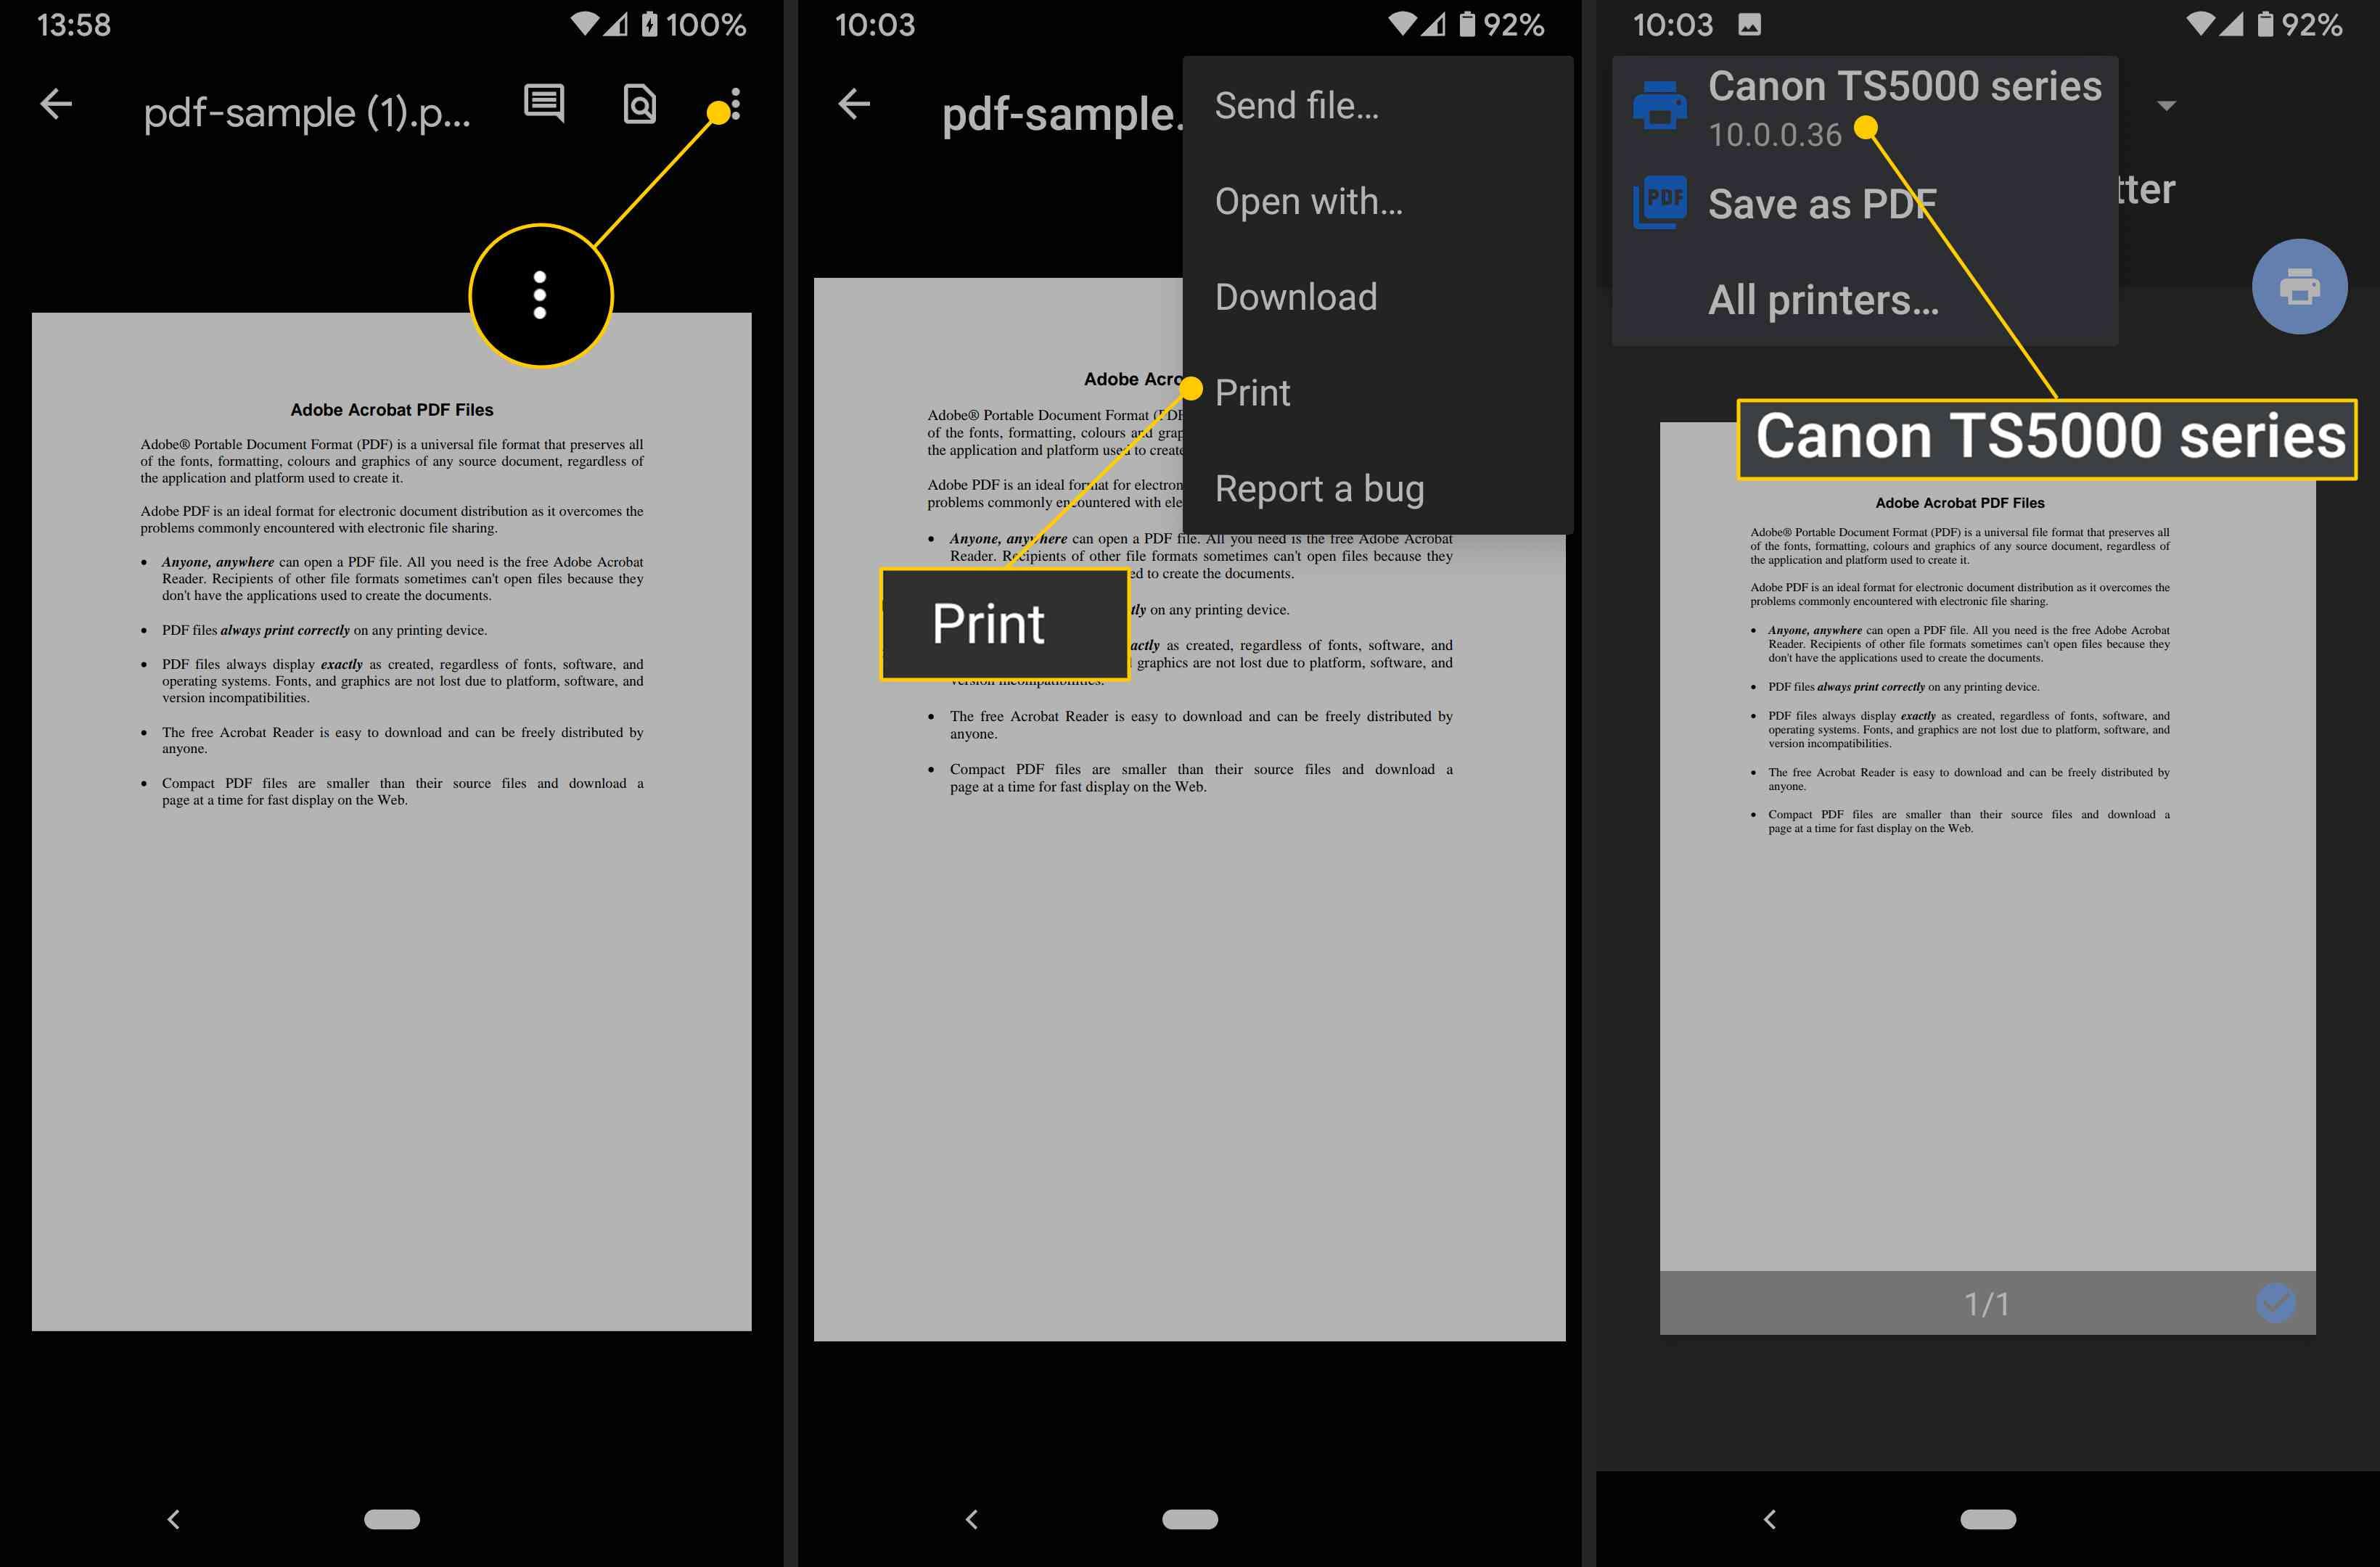 Three dot menu, Print, printer to choose